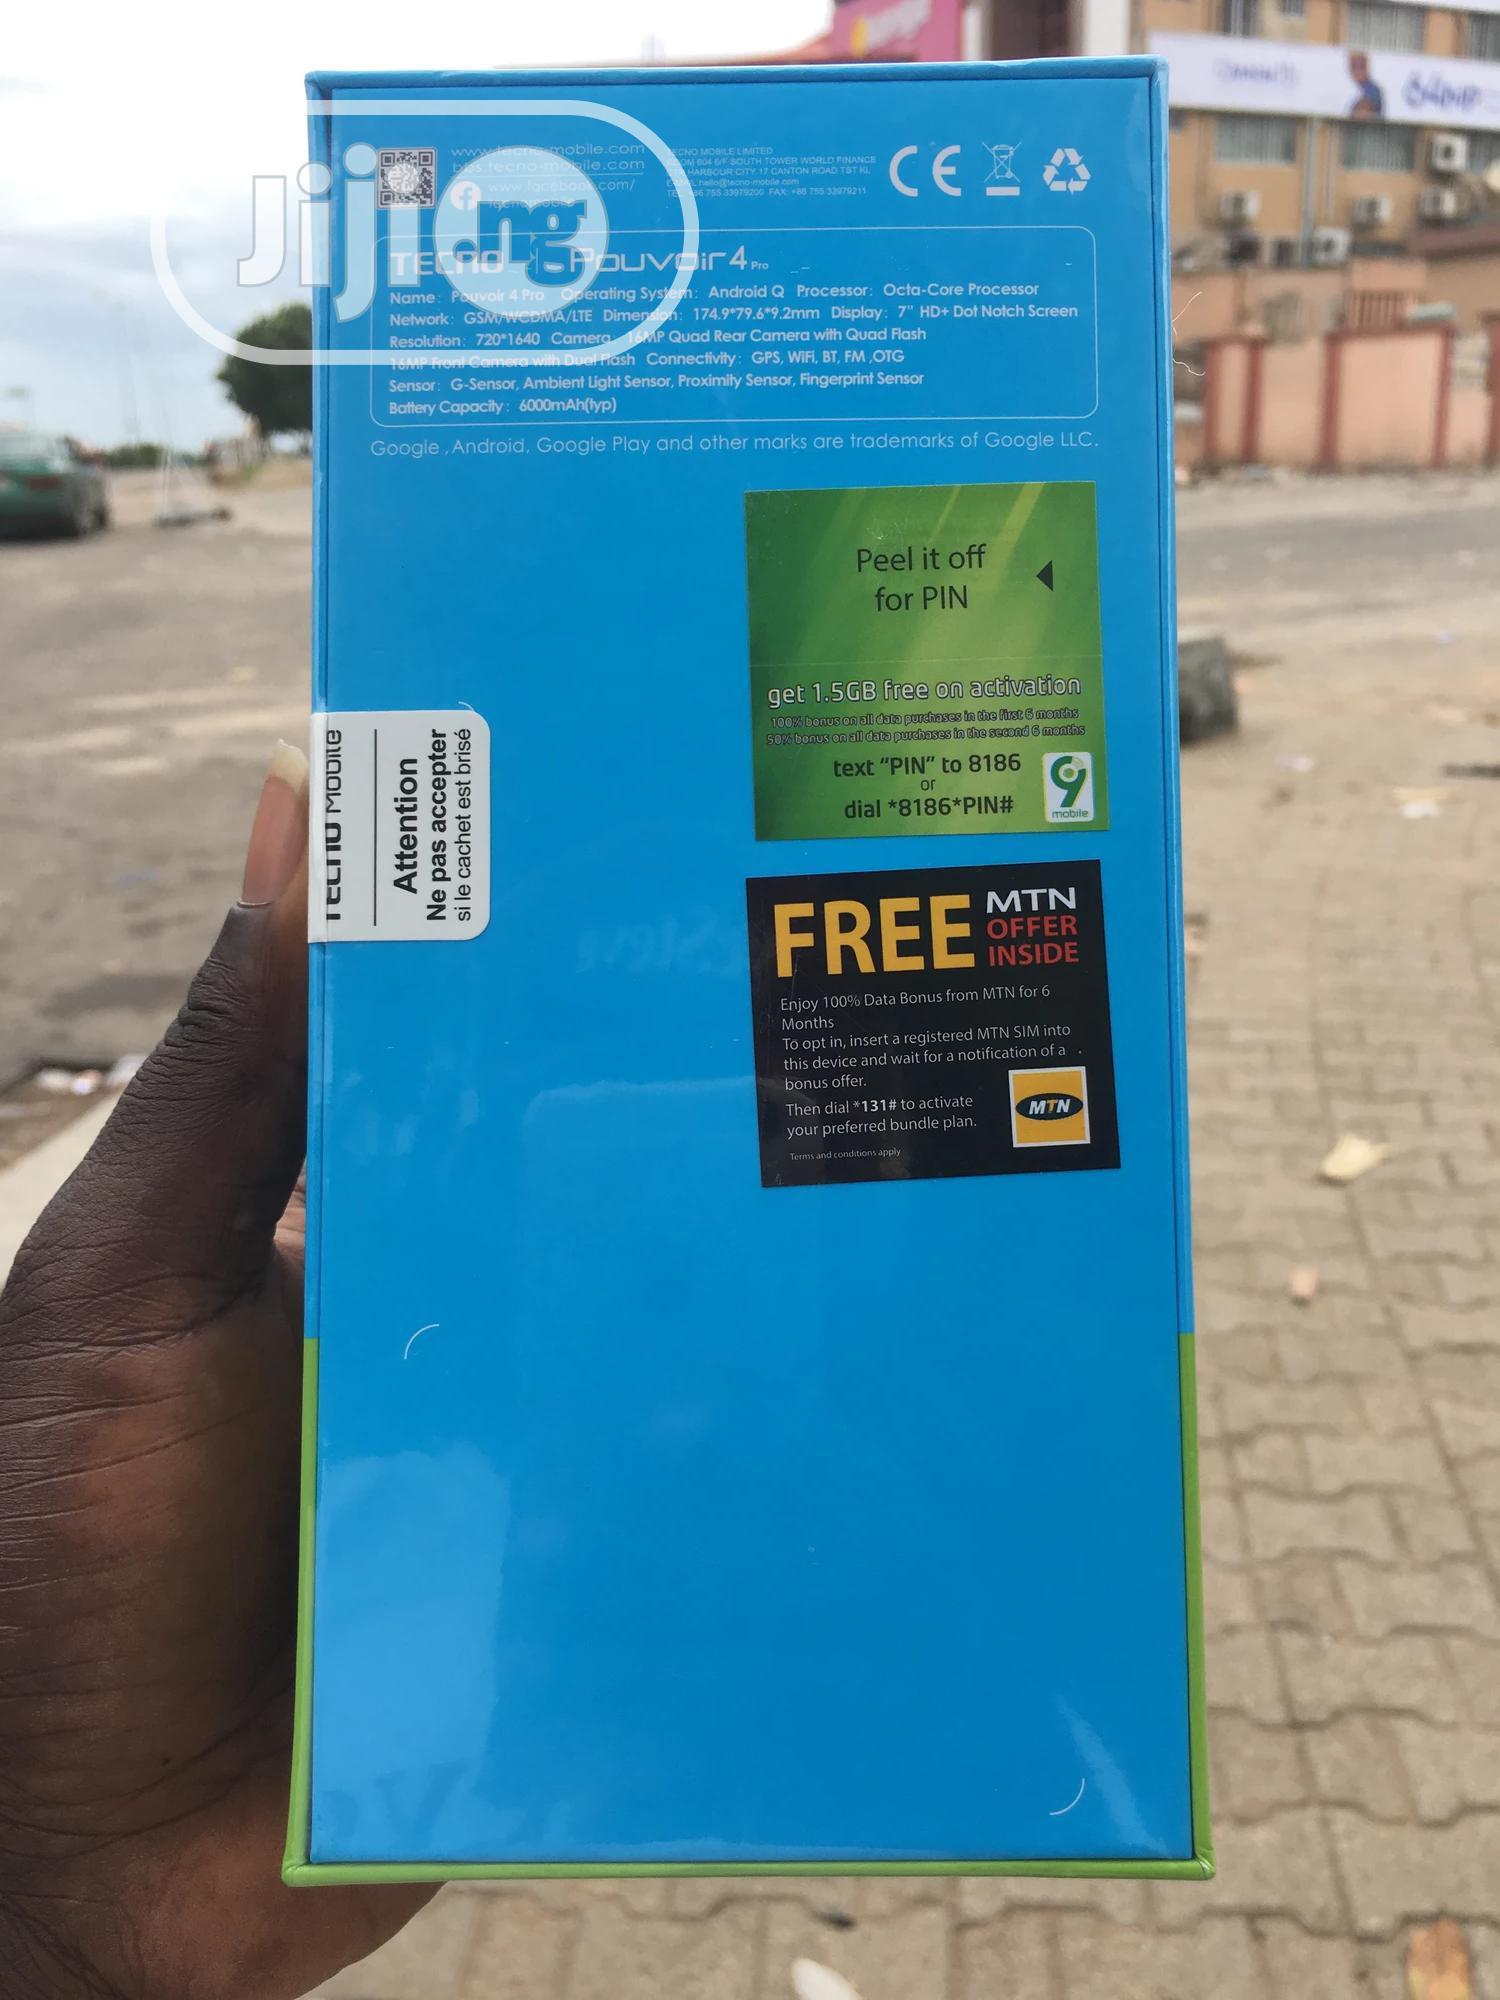 New Tecno Pouvoir 4 Pro 128 GB Black | Mobile Phones for sale in Wuse 2, Abuja (FCT) State, Nigeria